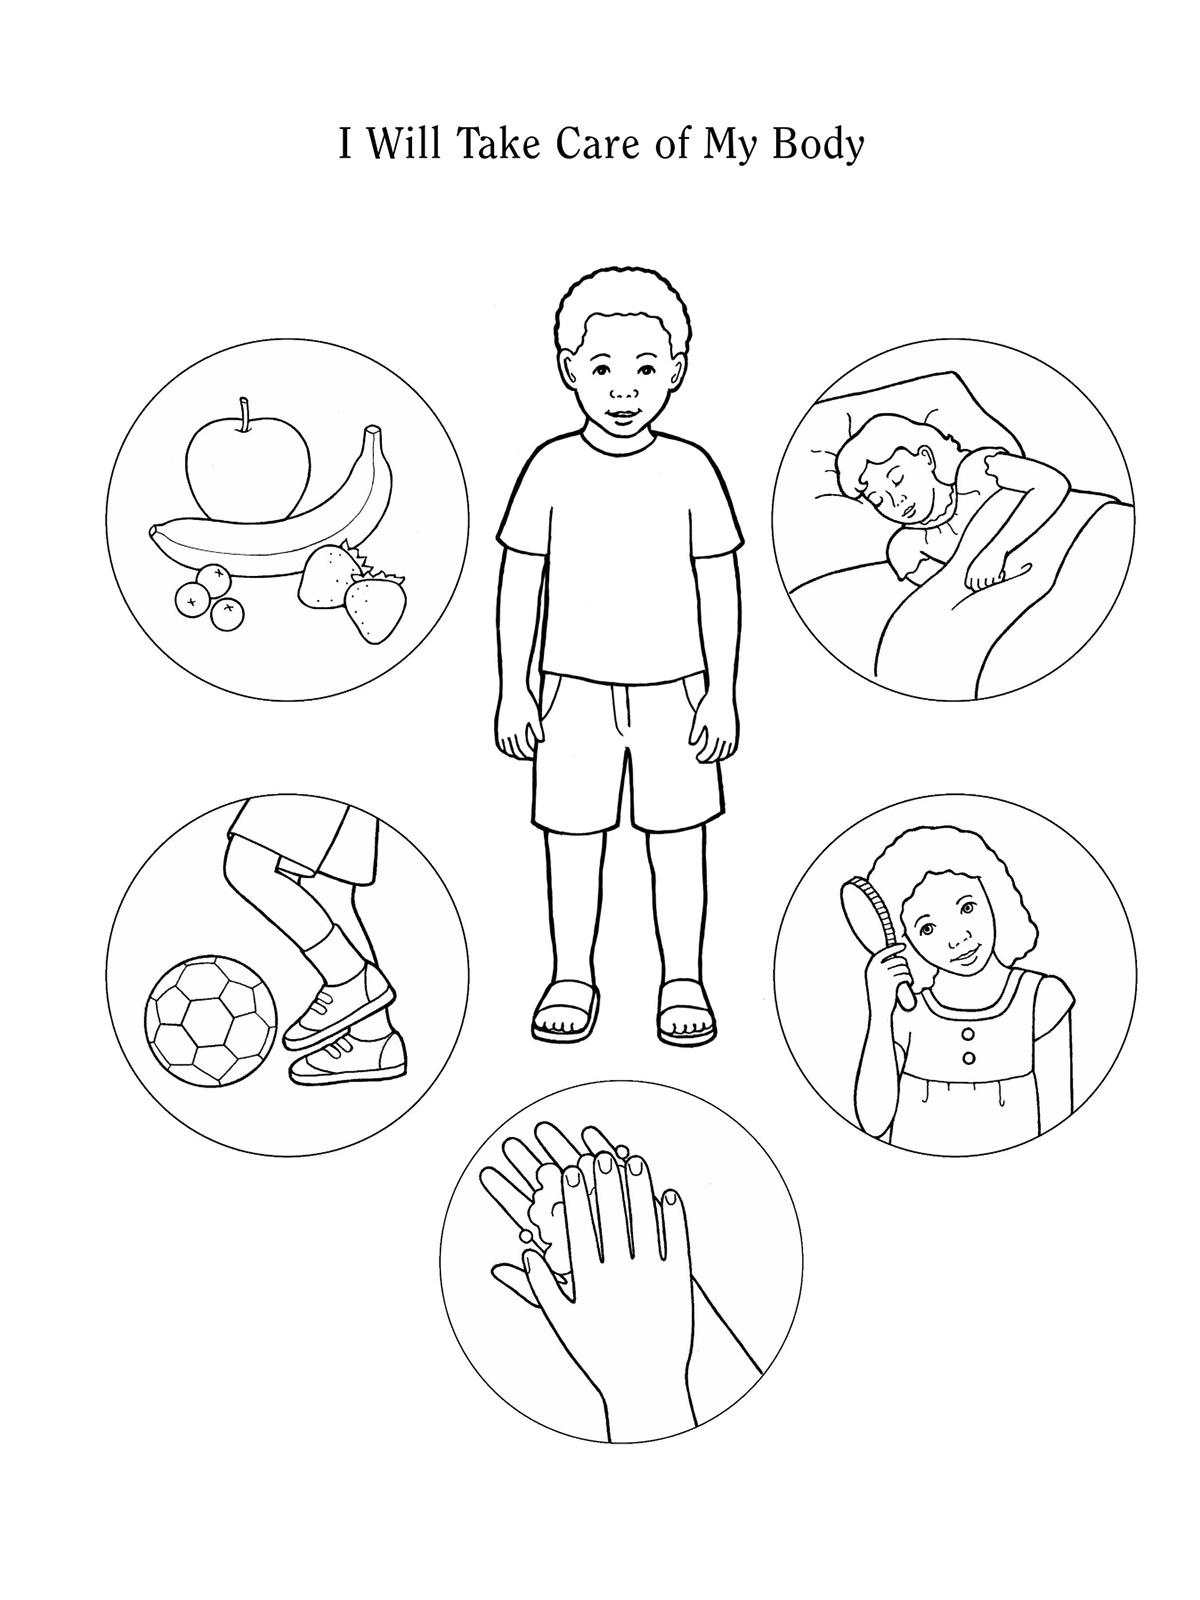 Taking Care Of The Body Worksheets For Kindergarten